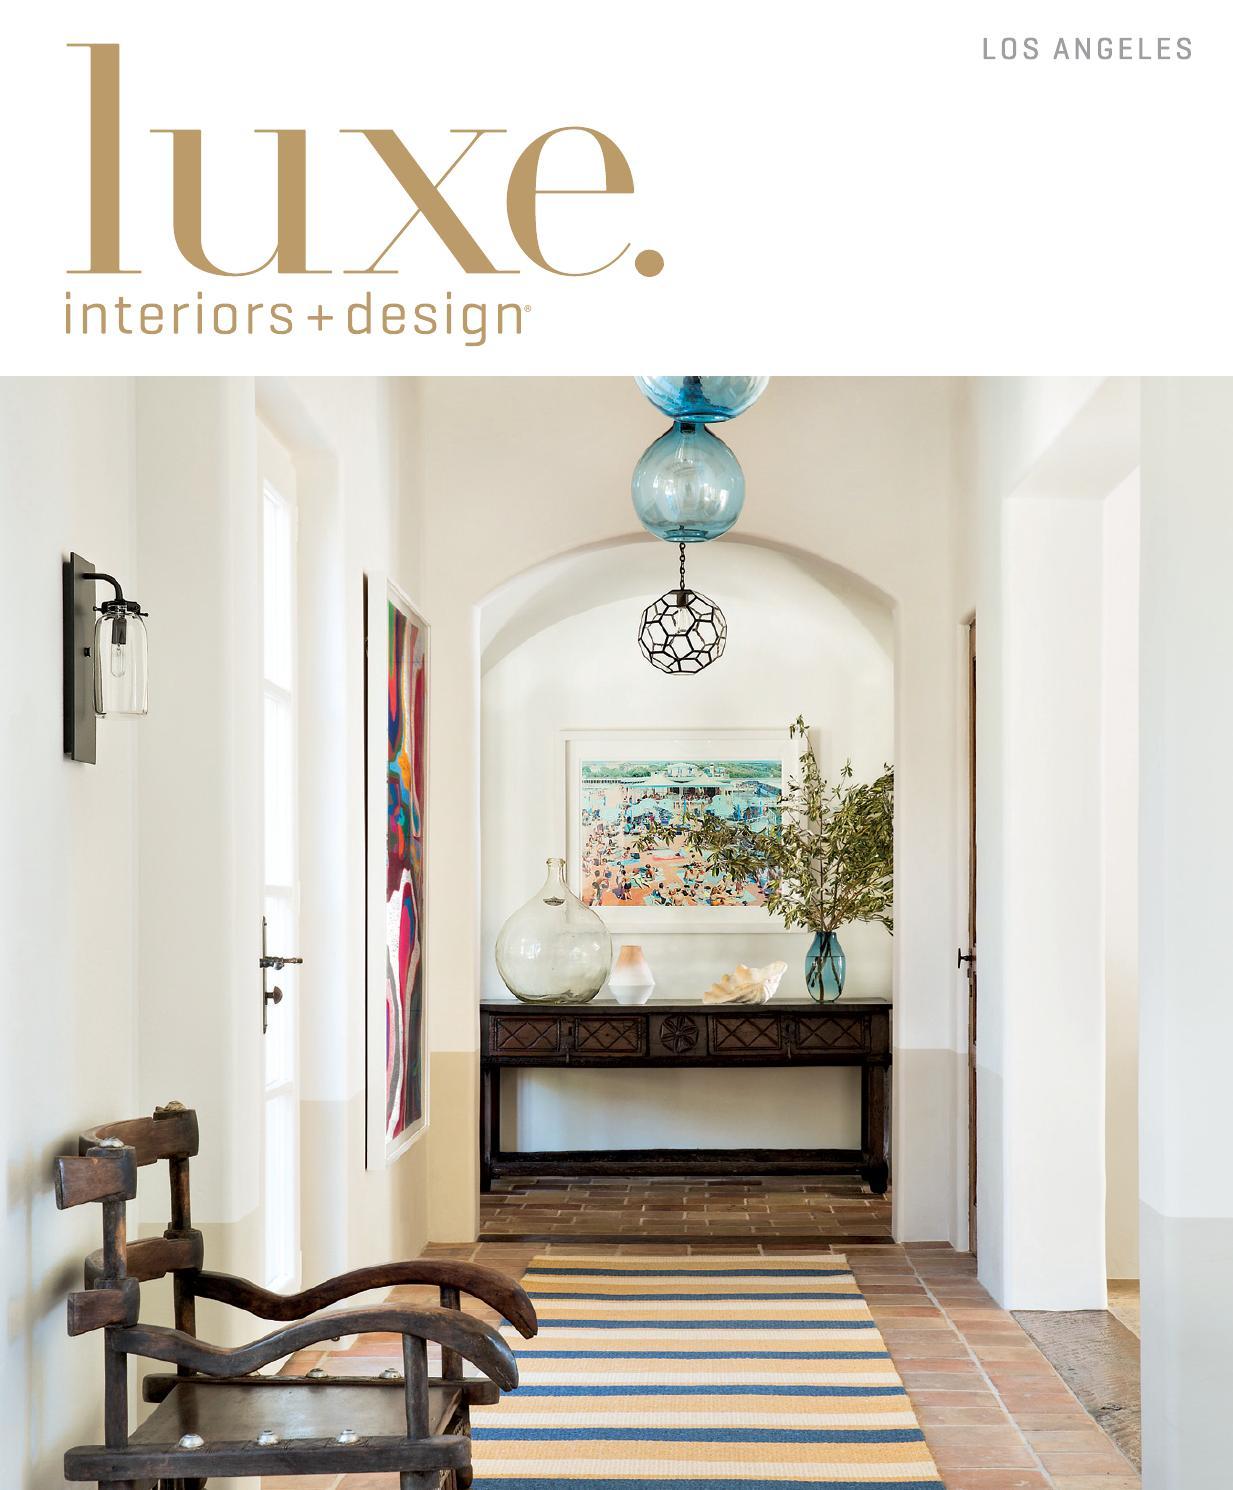 LUXE Interiors + Design - LOS ANGELES